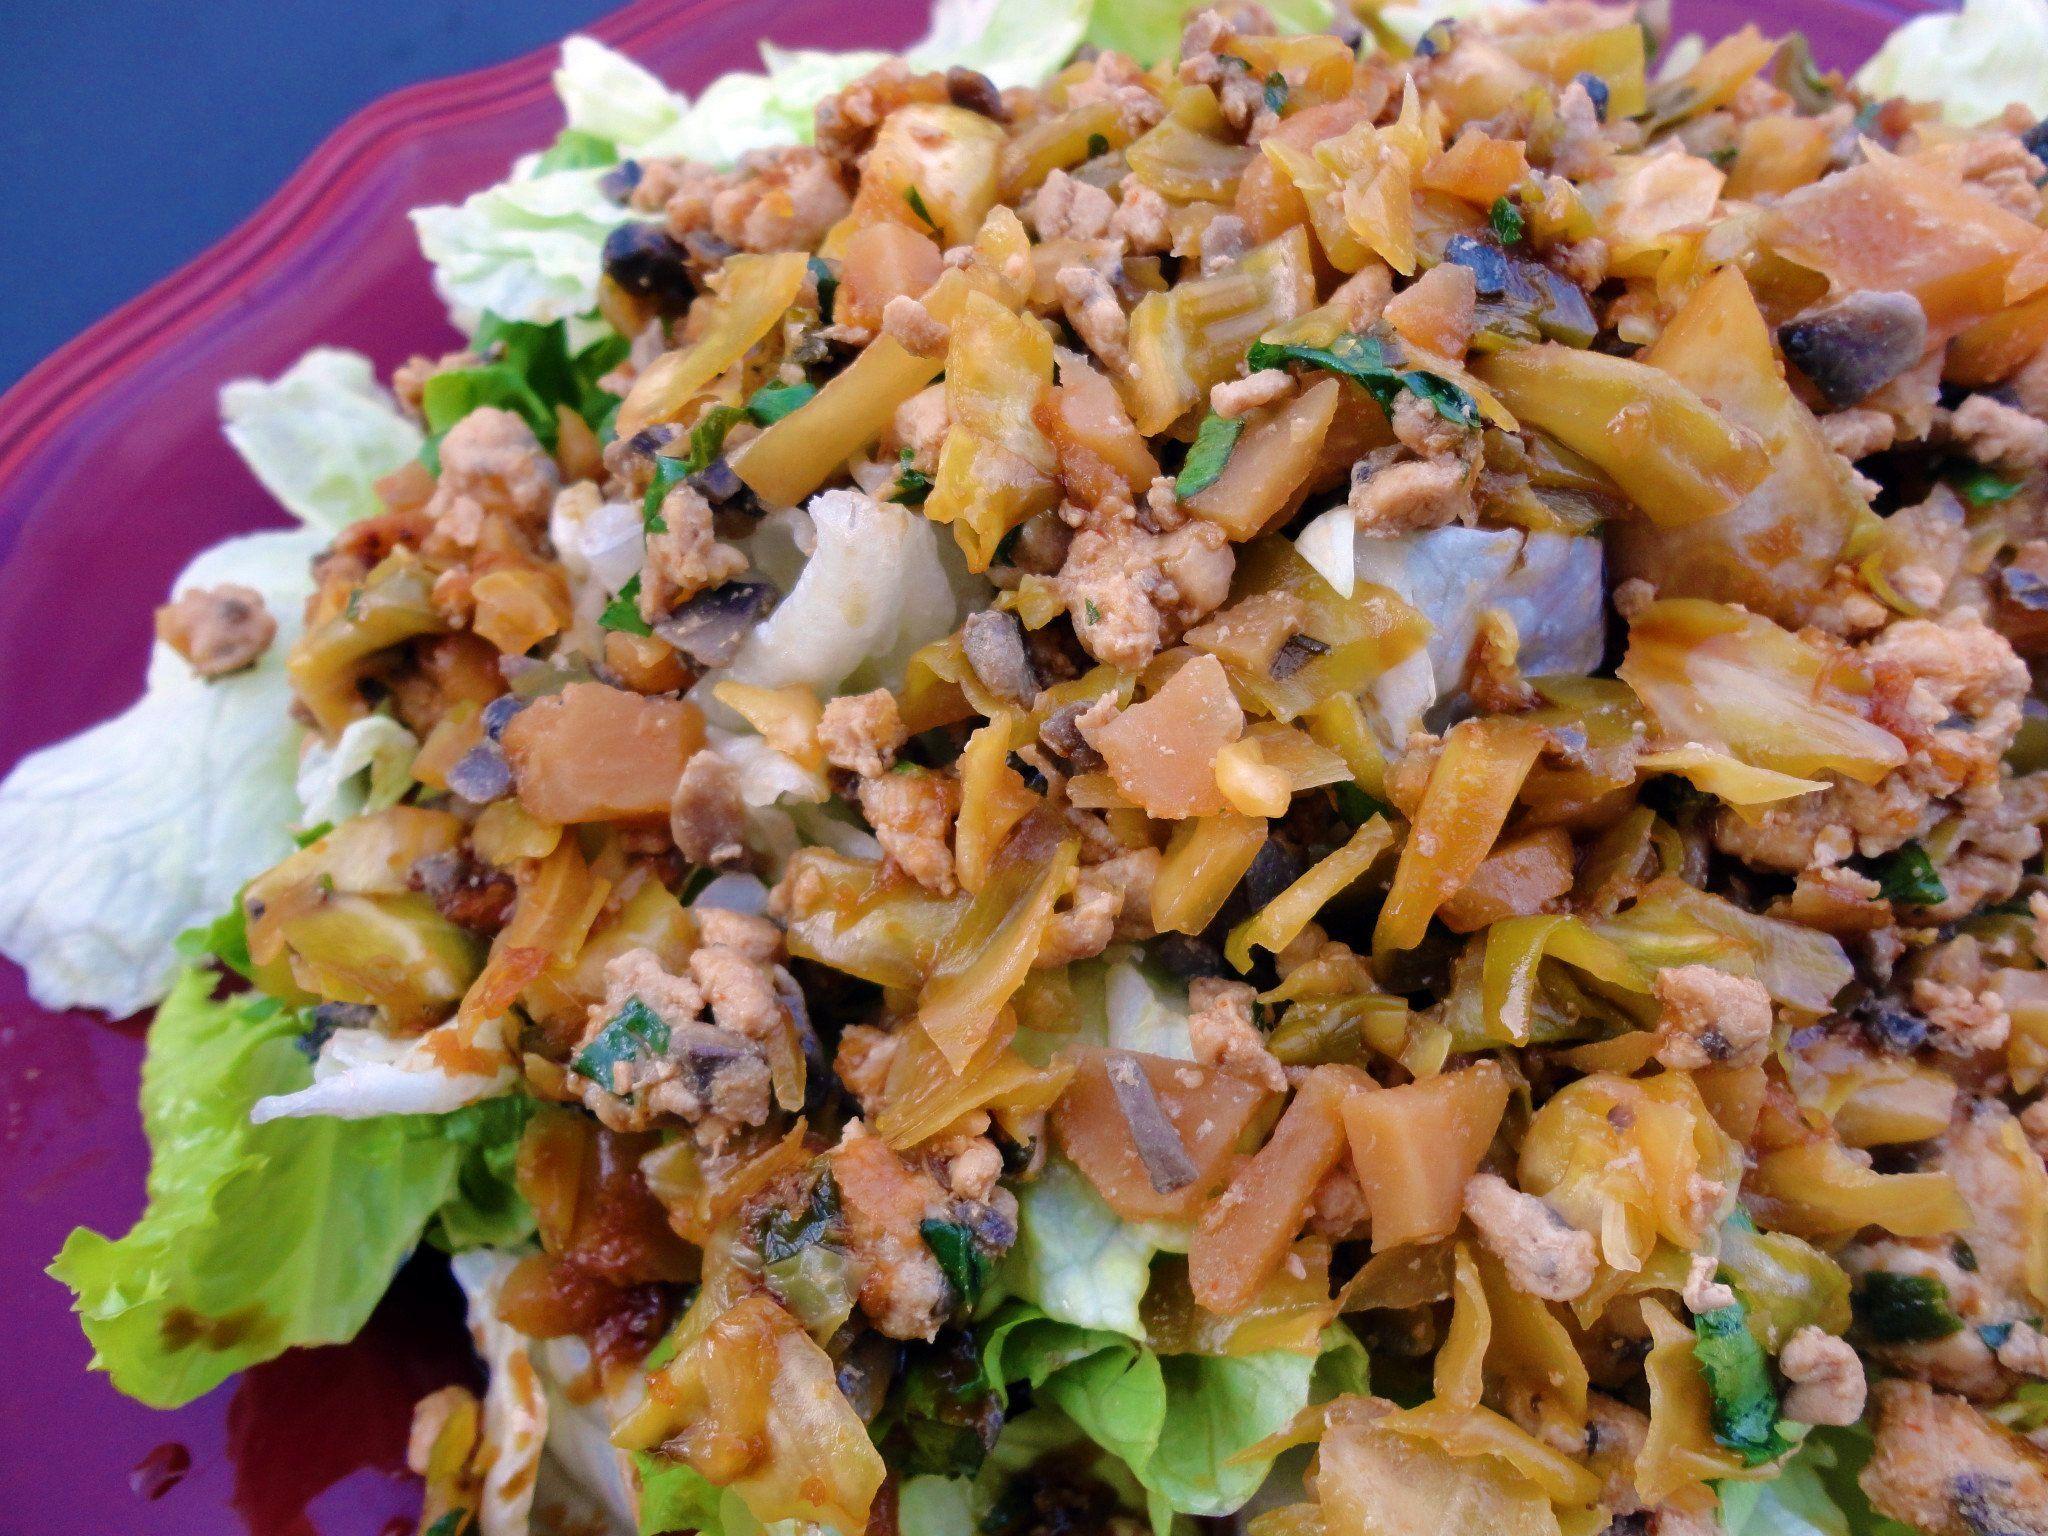 Asian Lettuce Wrap Salad